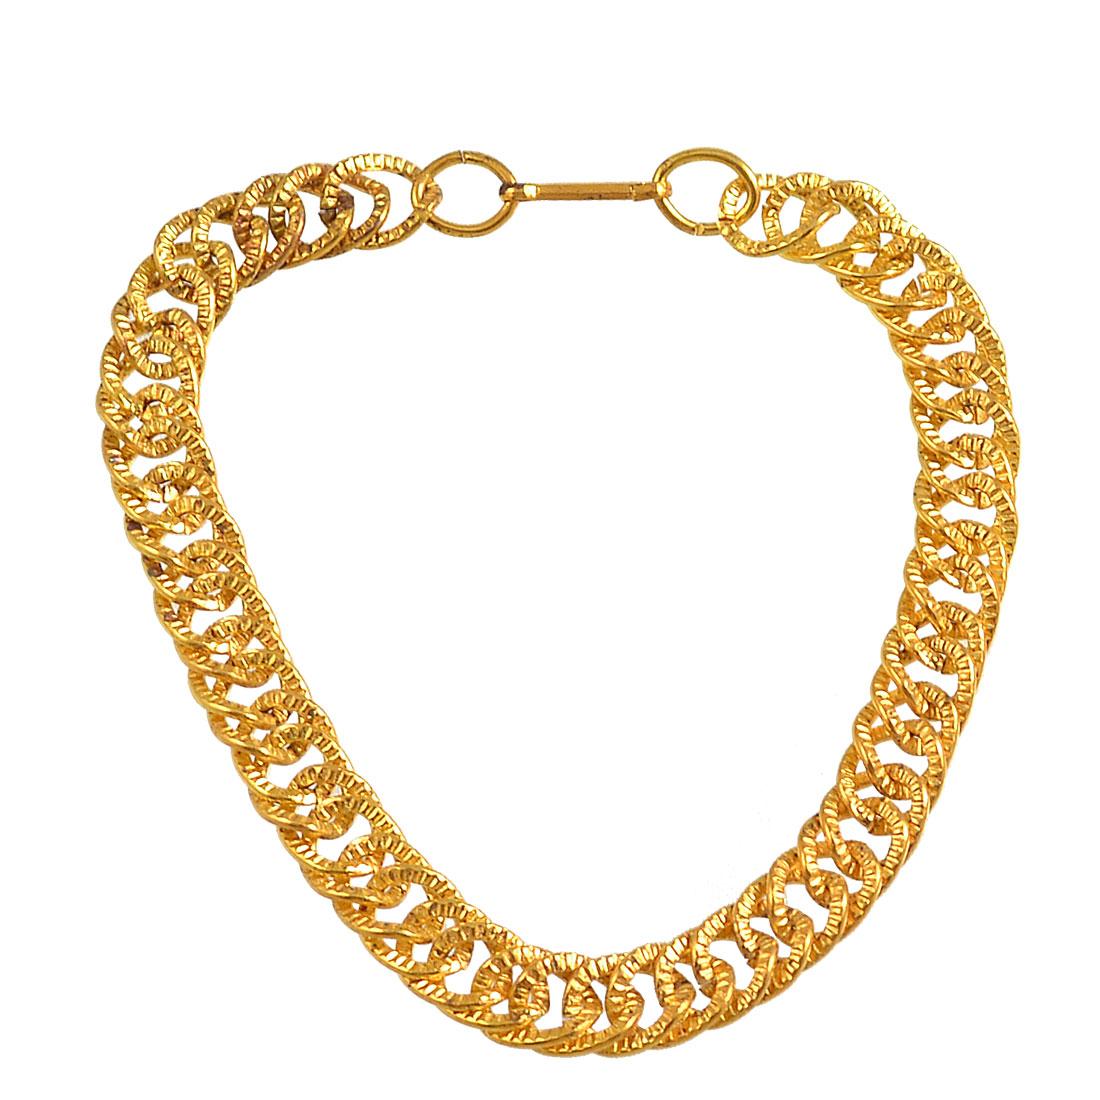 Lady Man Clip Closure Gold Tone Metal Wrist Chain Bracelet Bangle